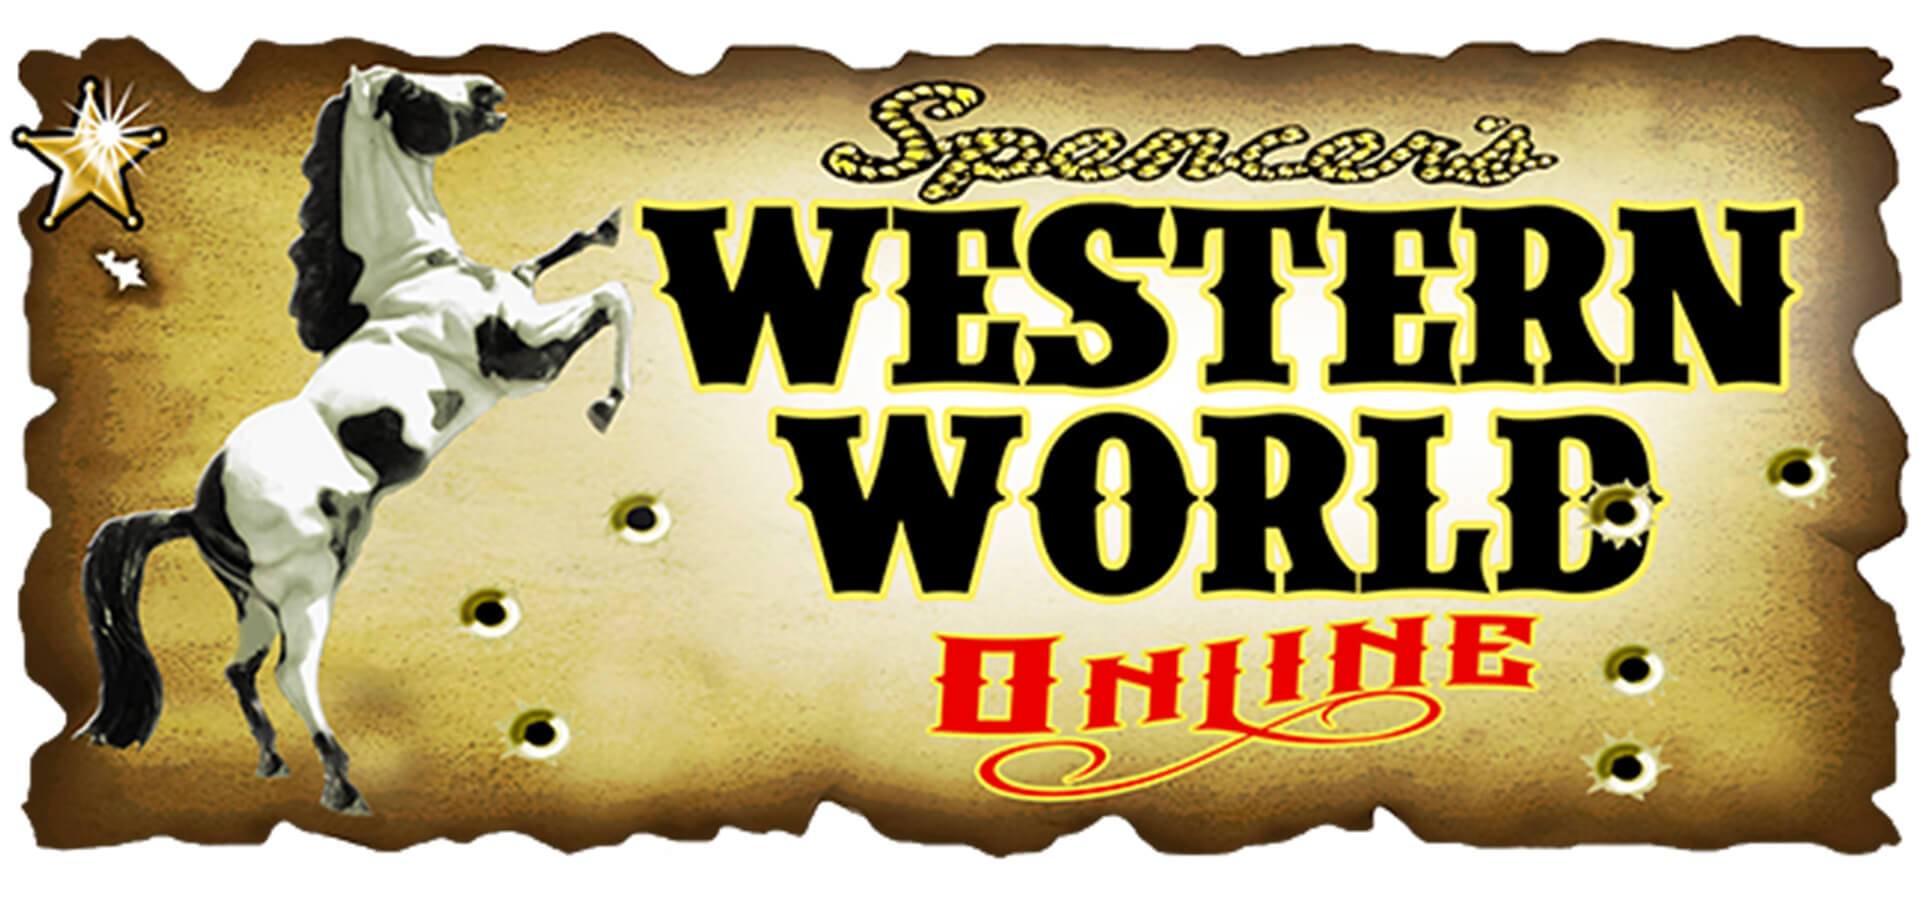 Spencer's Western World